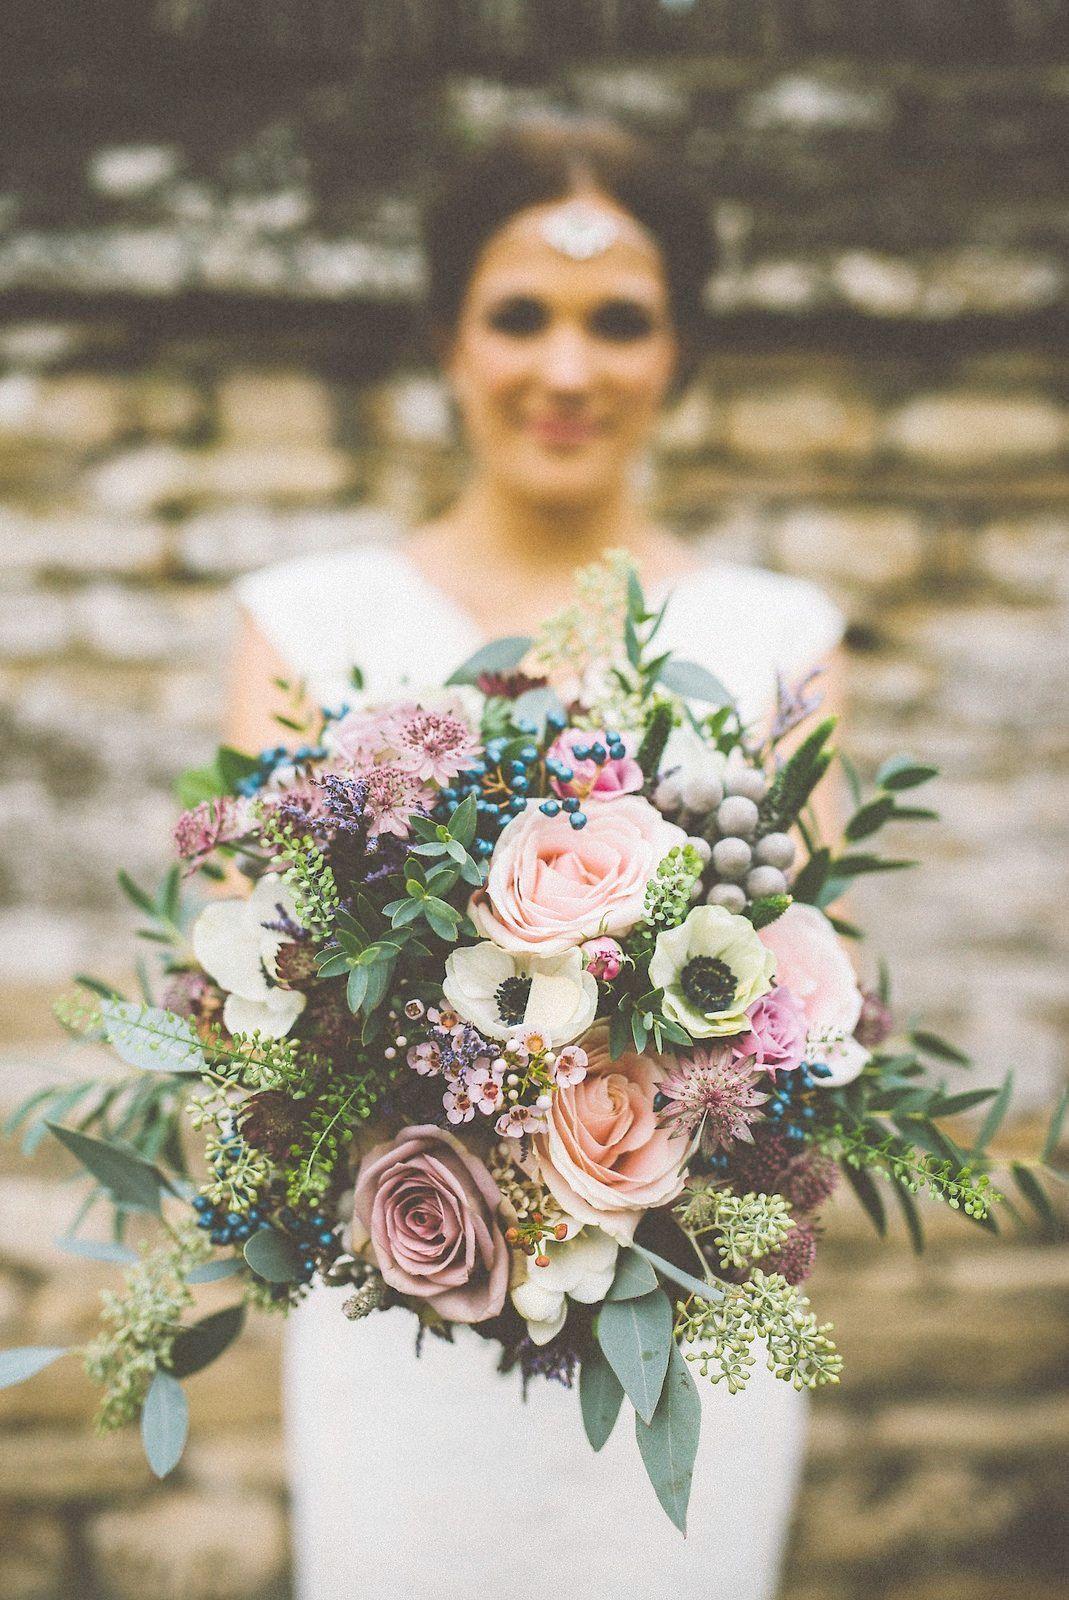 Sweet ue traditional wedding flowers bride wedding pinterest